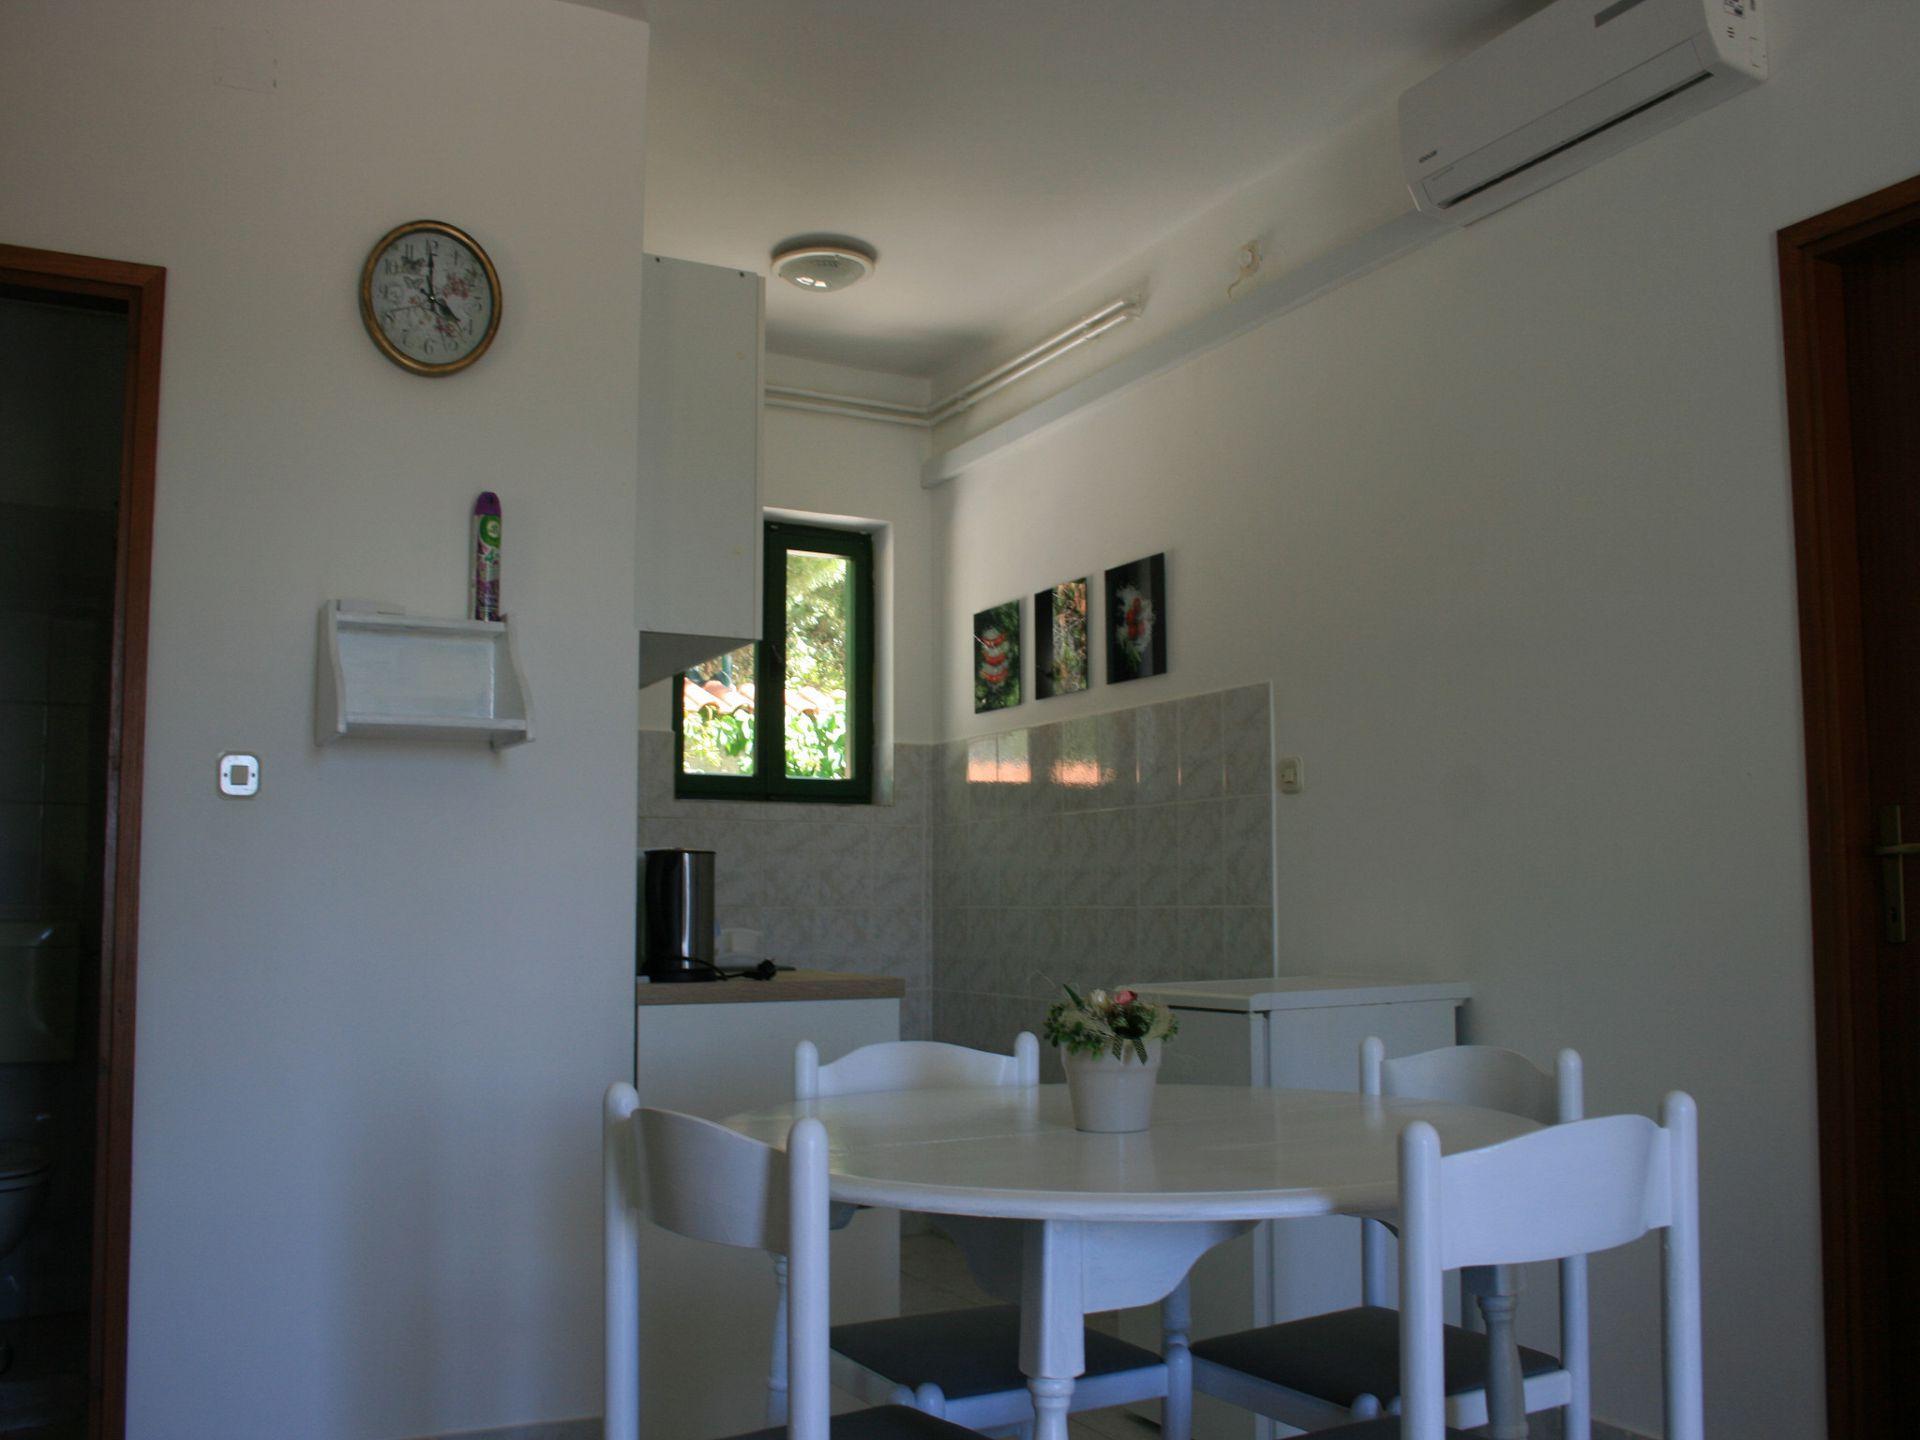 37656 - Jezera - Apartments Croatia - A-Laura(2+2): kitchen and dining room